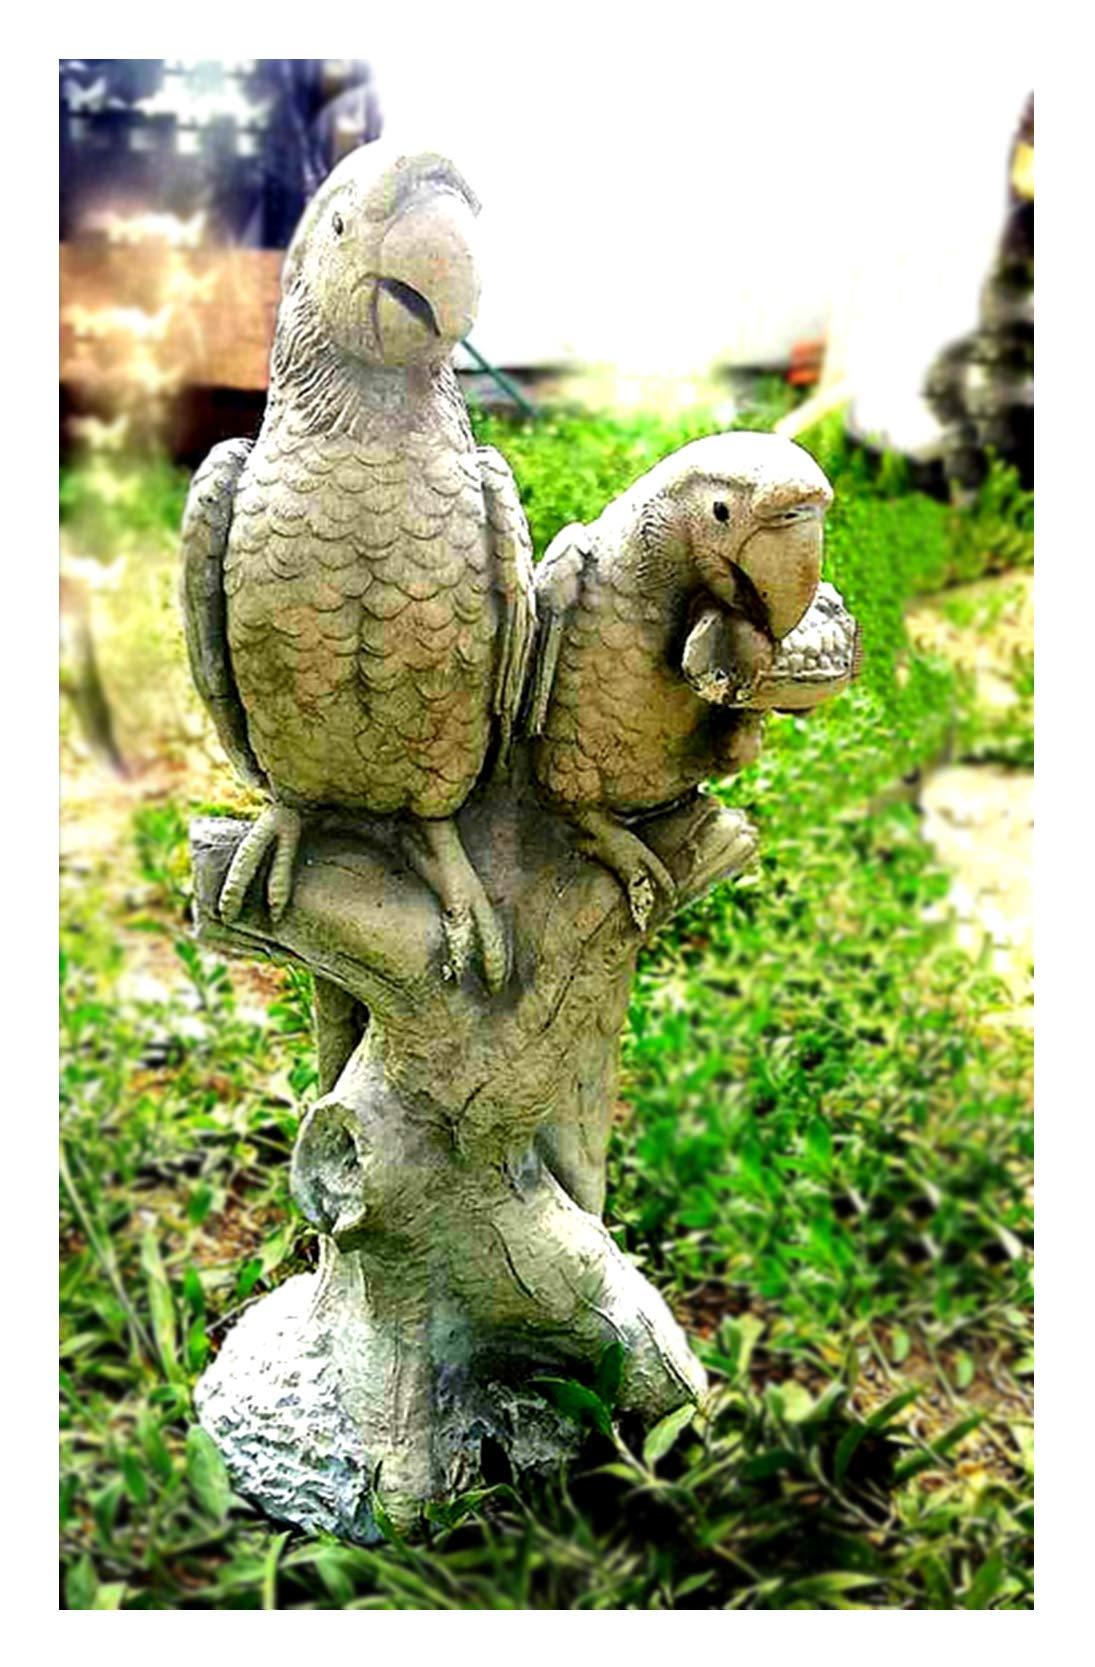 FORMDEKOR-UA Polyurethane Flexible Form Parrots   Polyurethane Forms   Polyurethane Texture   Polyurethane Stamping   Figurine Decor   Garden Decor   Garden Statue   Garden Figures